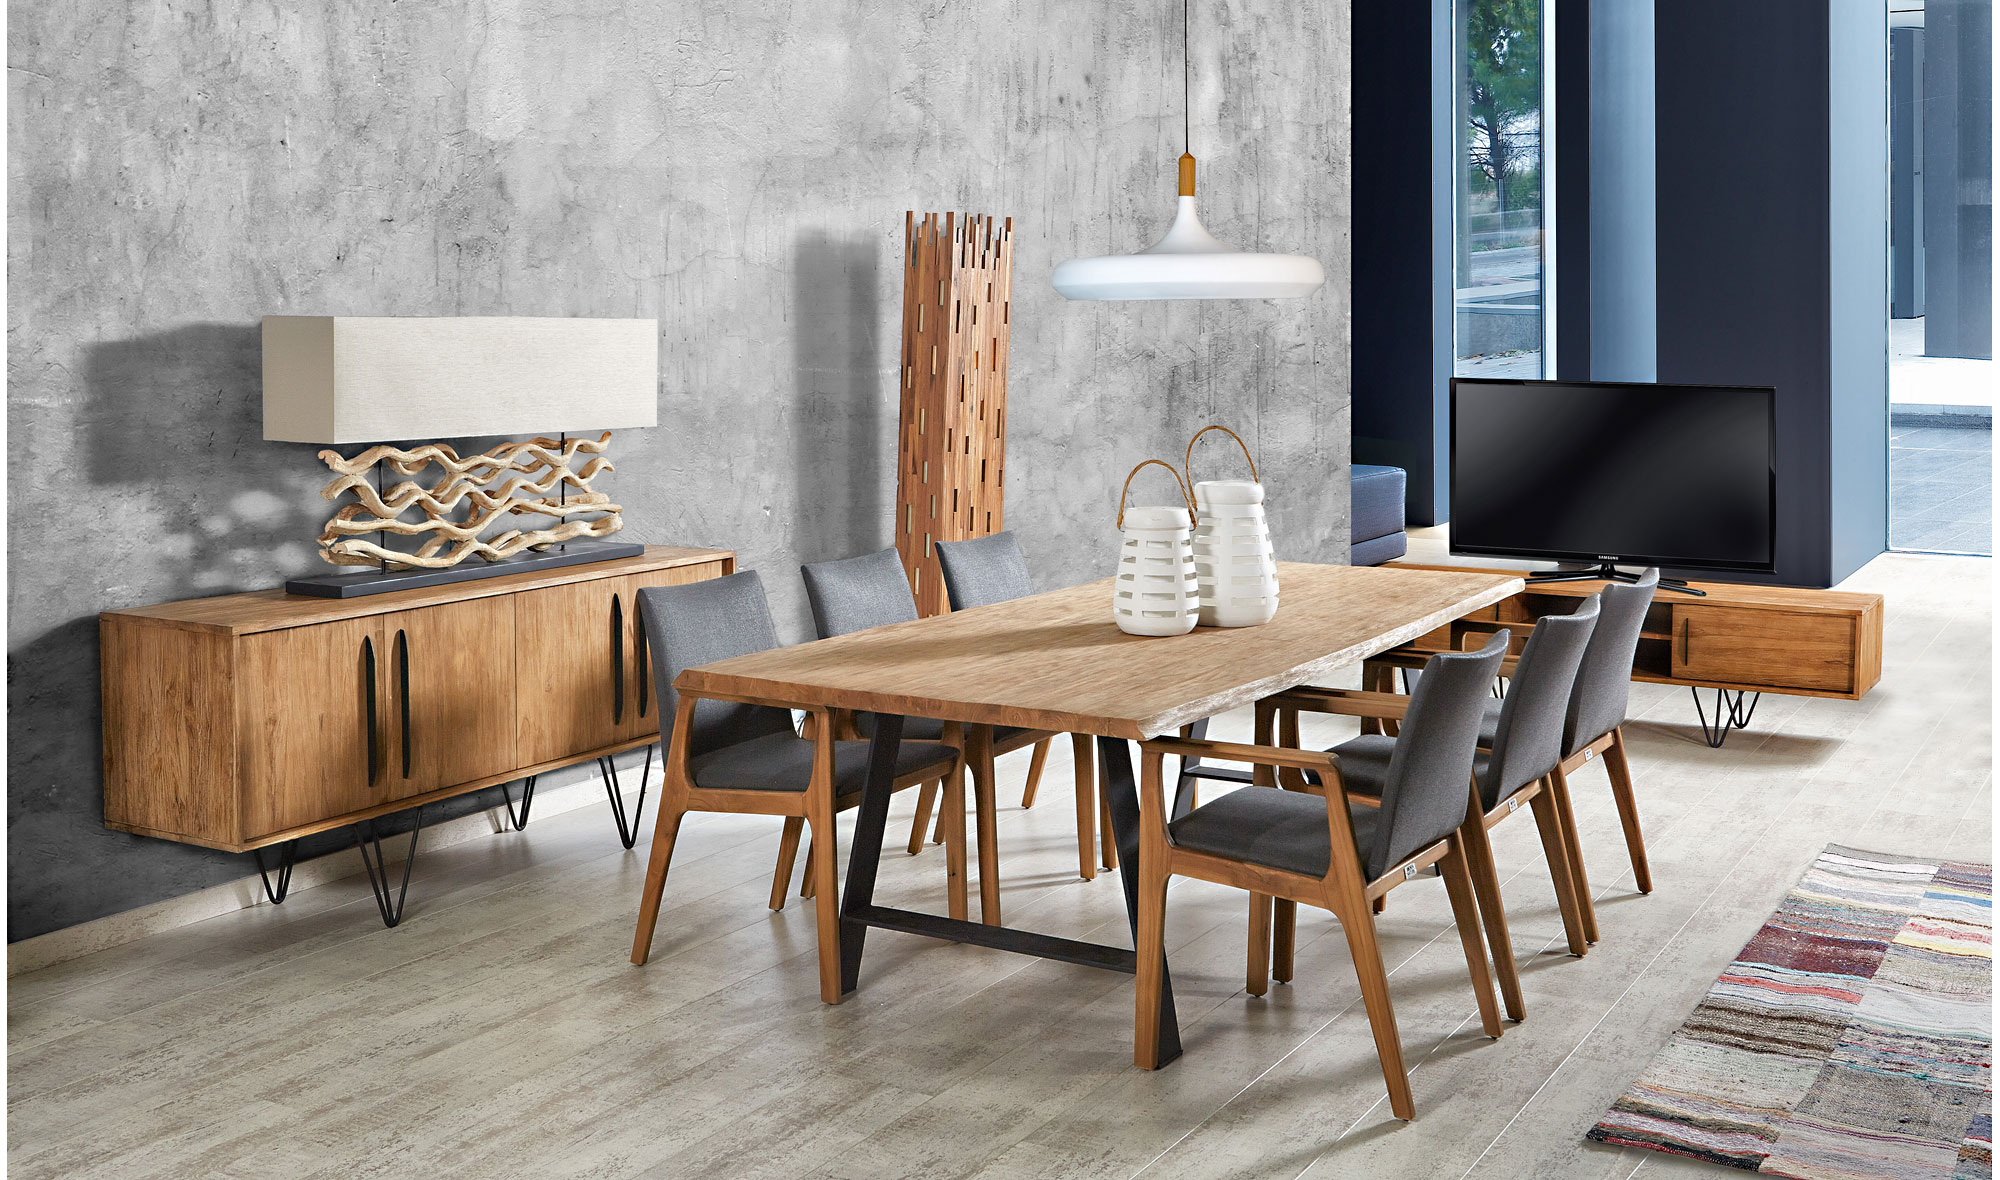 Comedor vintage lokken en for Muebles modernos para comedores pequenos